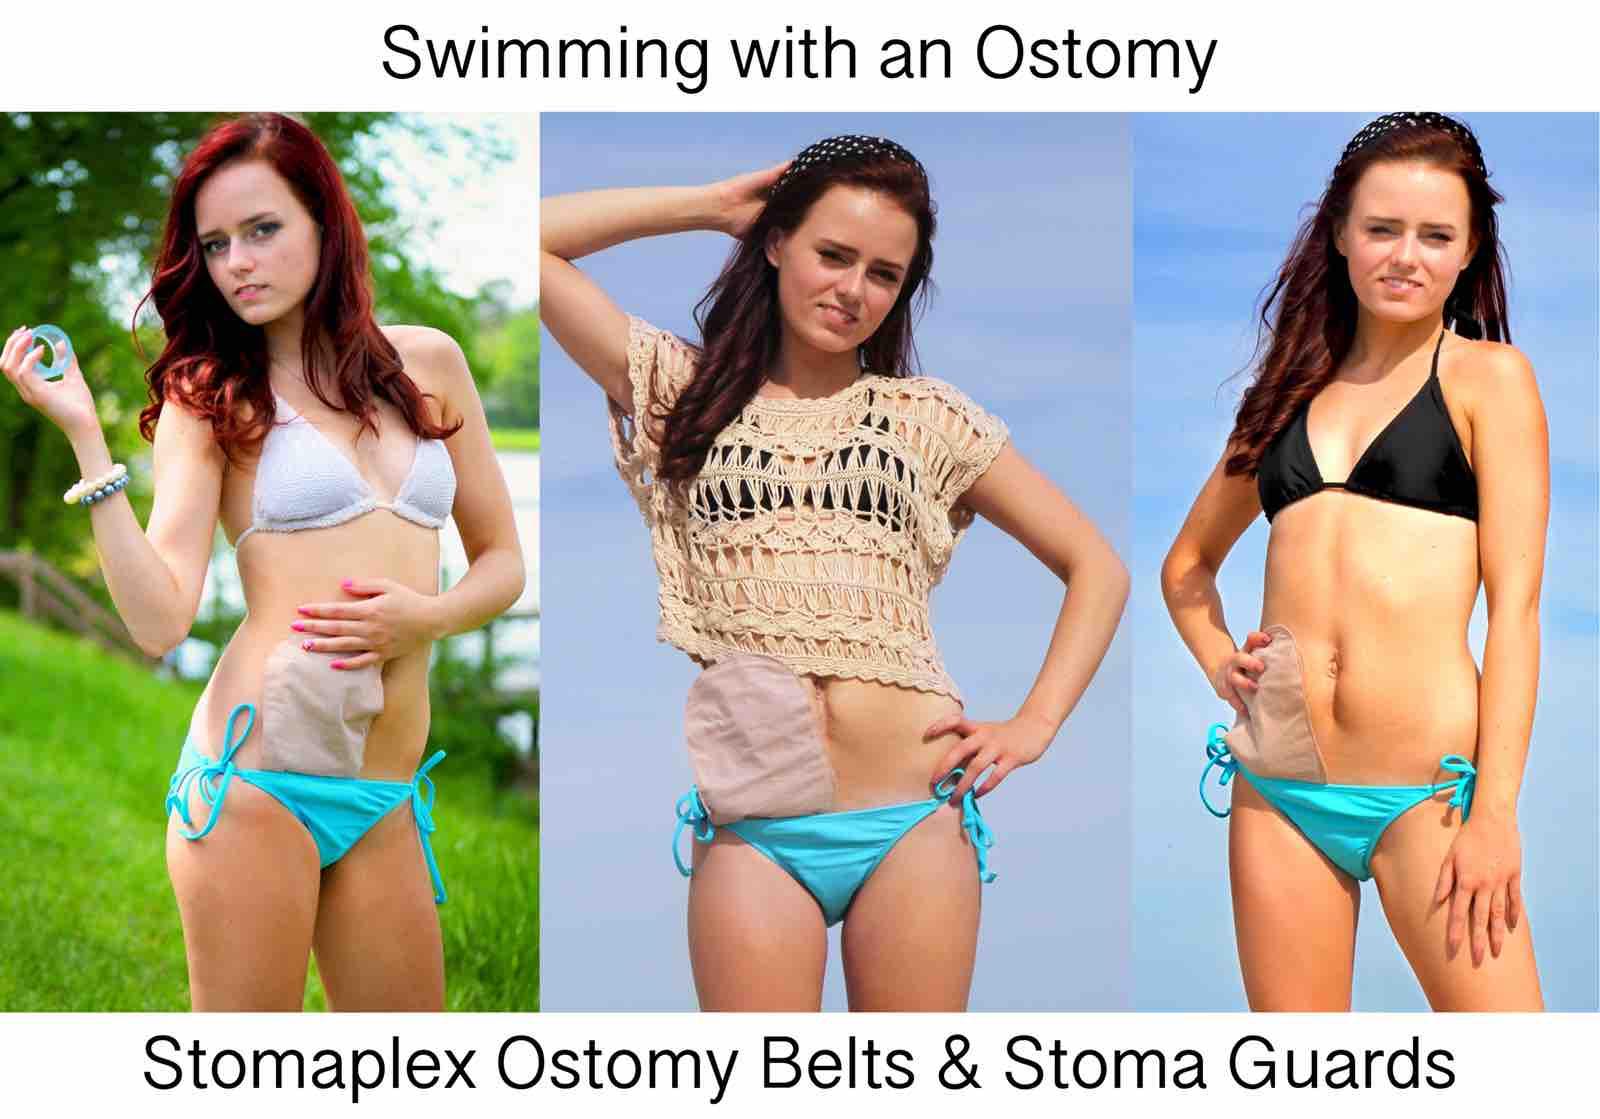 Ostomy Wraps for Swimming